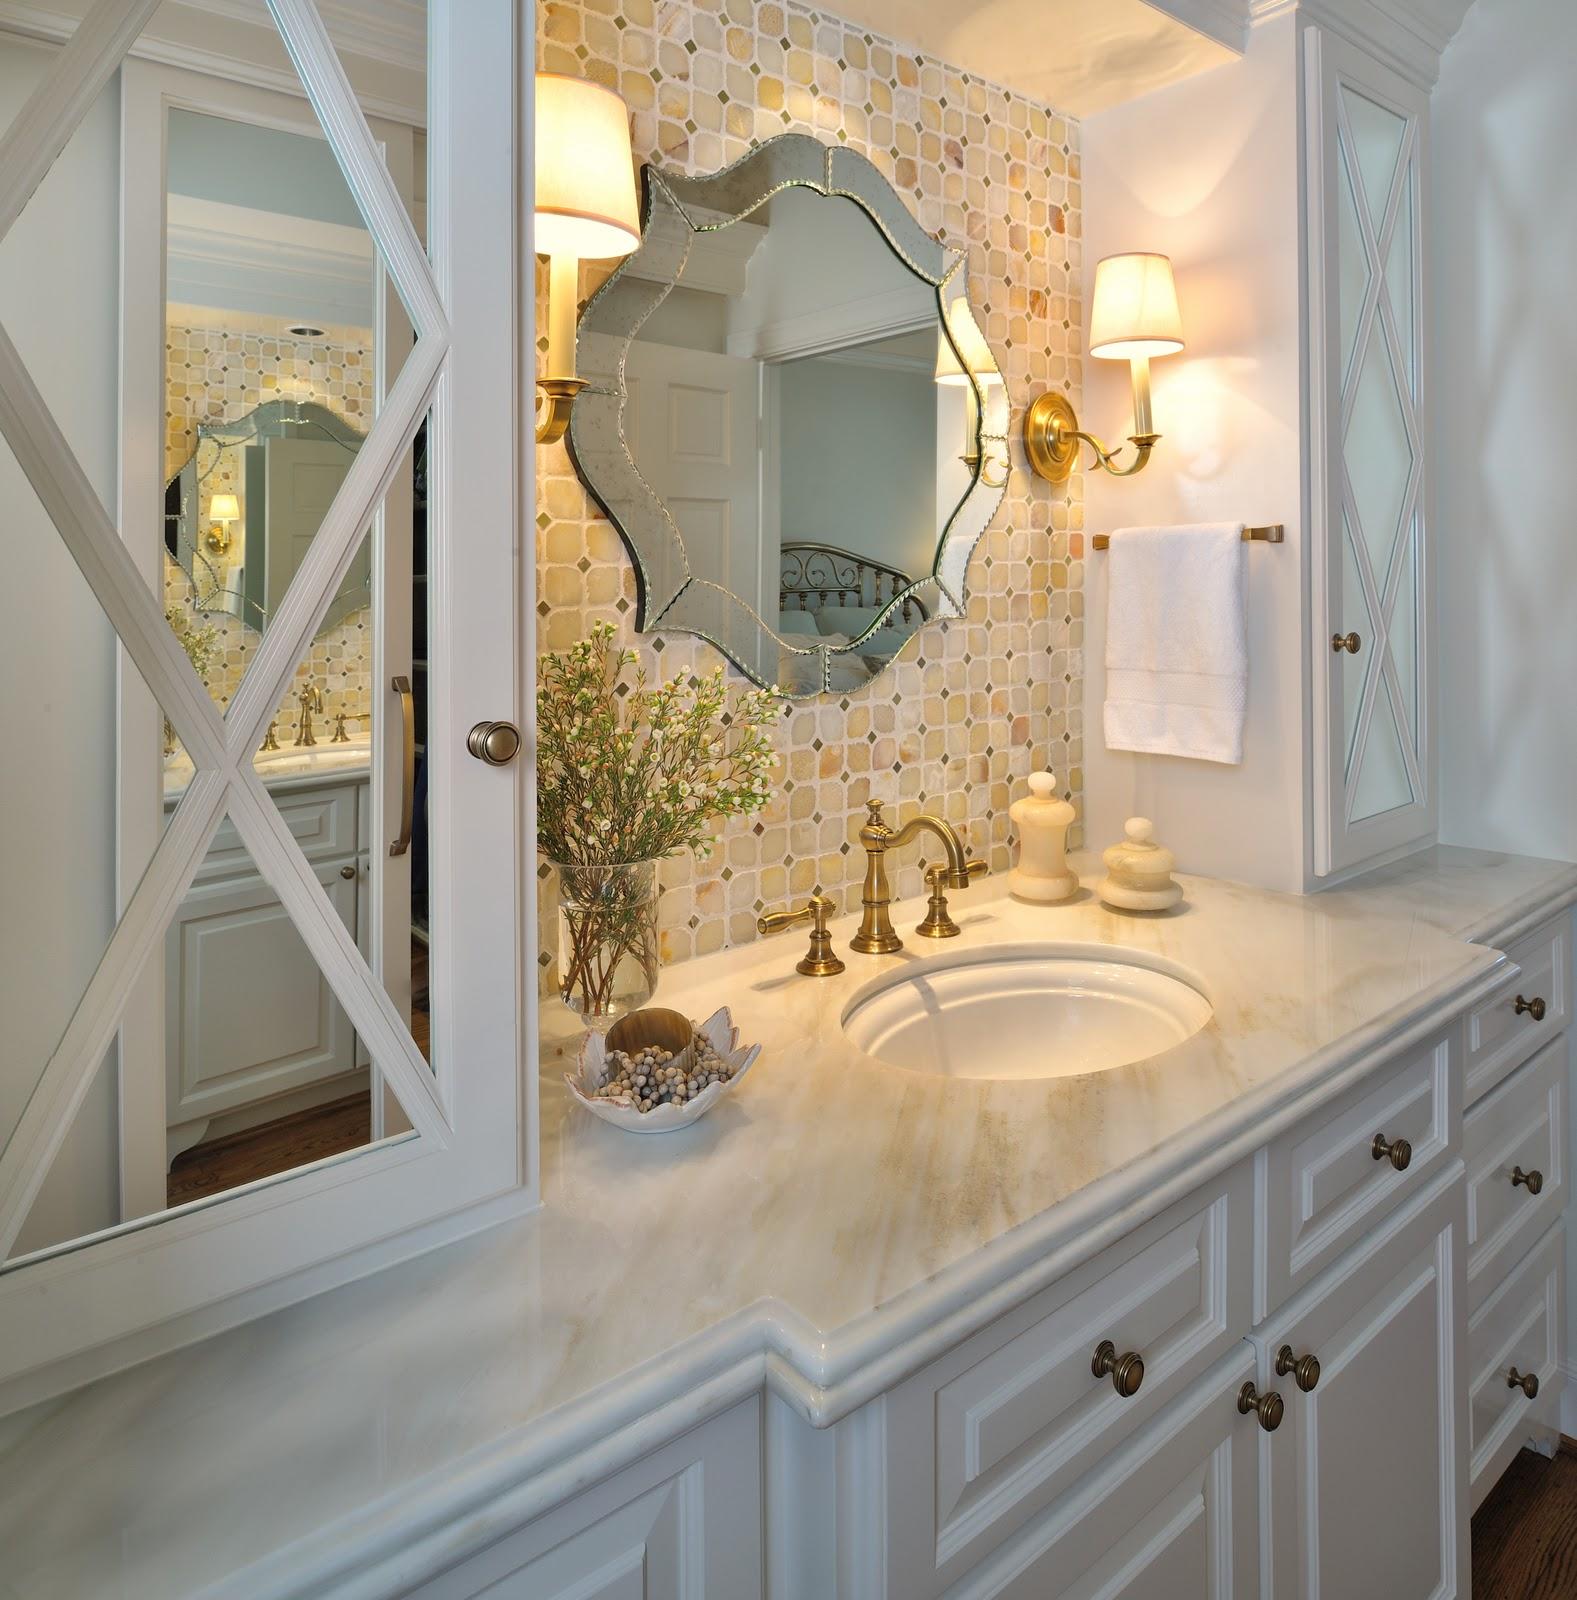 lighting fascinating gold fixtures beautiful beautiful bathroom vanity lighting design ideas